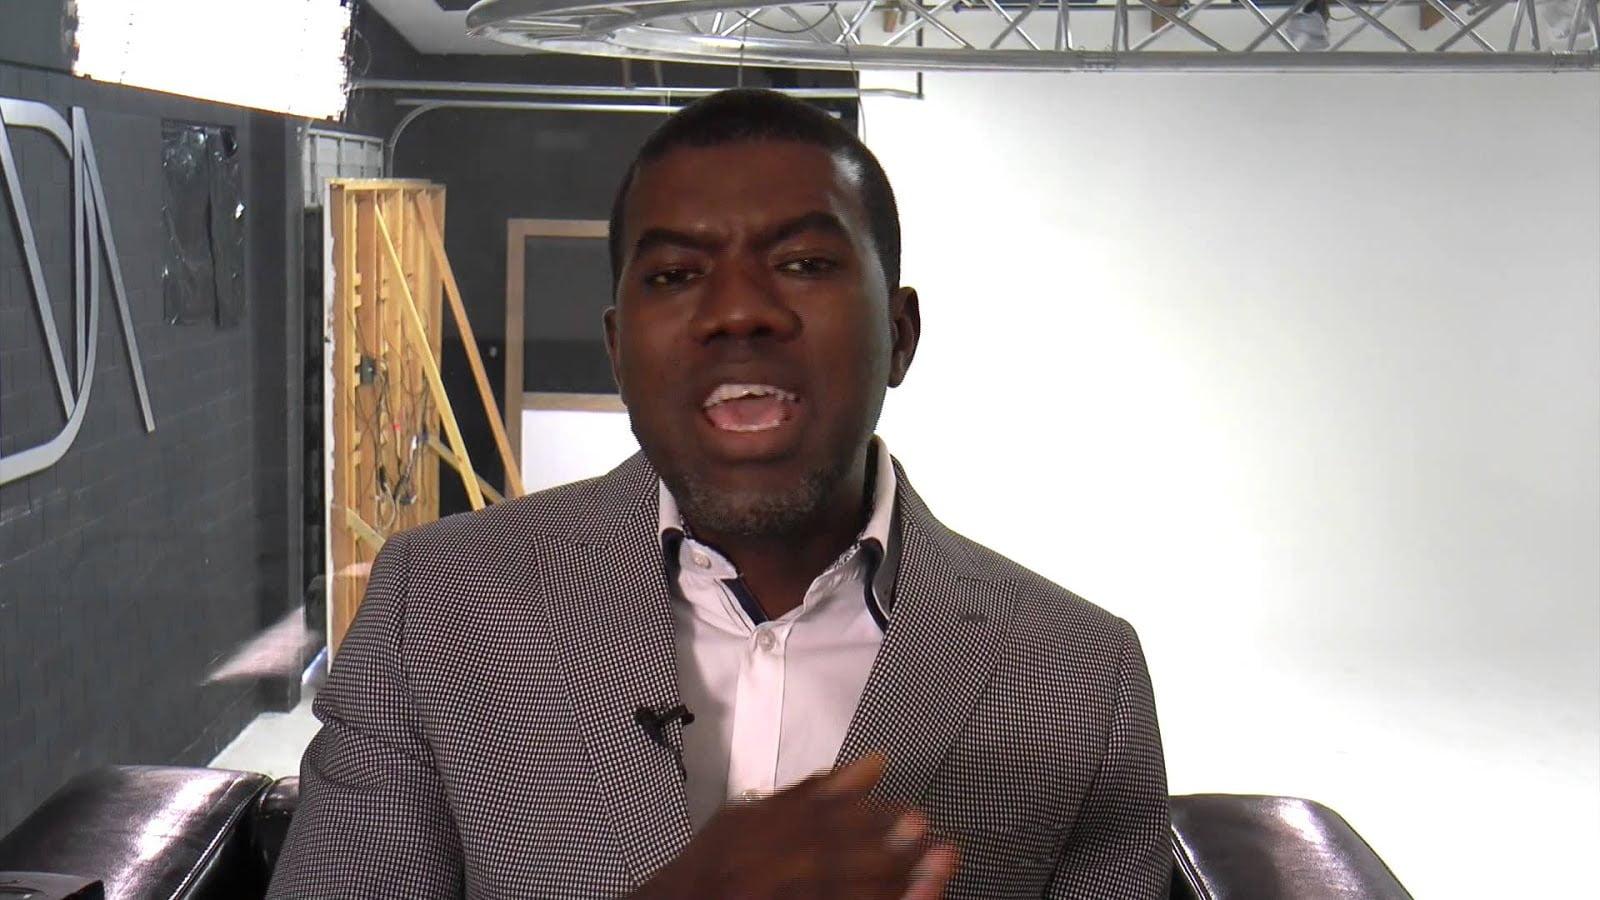 reno omokri - Atiku vs Buhari: Omokri claims to possess 'damning' proofs INEC had election server